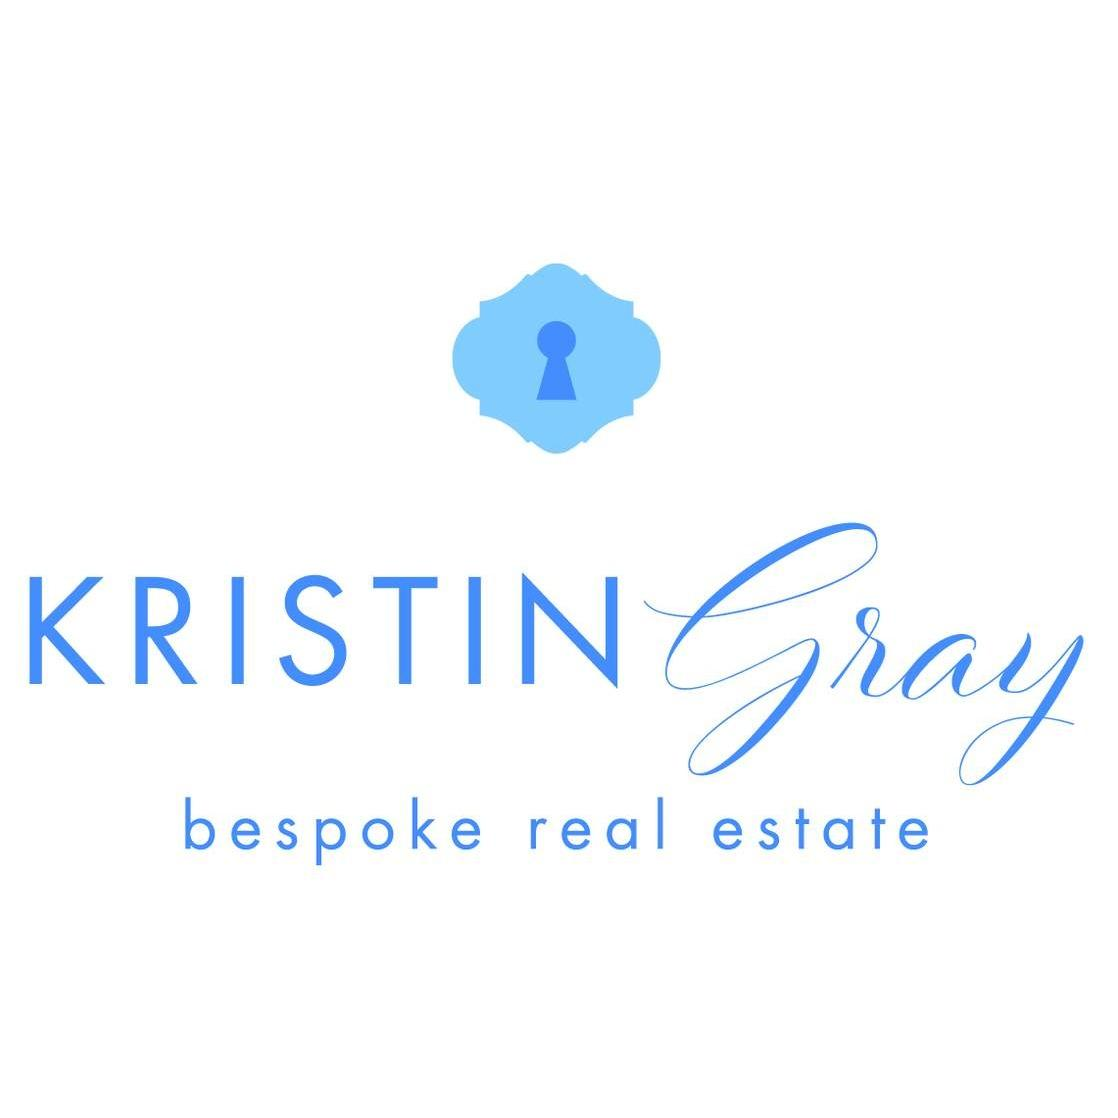 Kristin Gray - Bespoke Real Estate